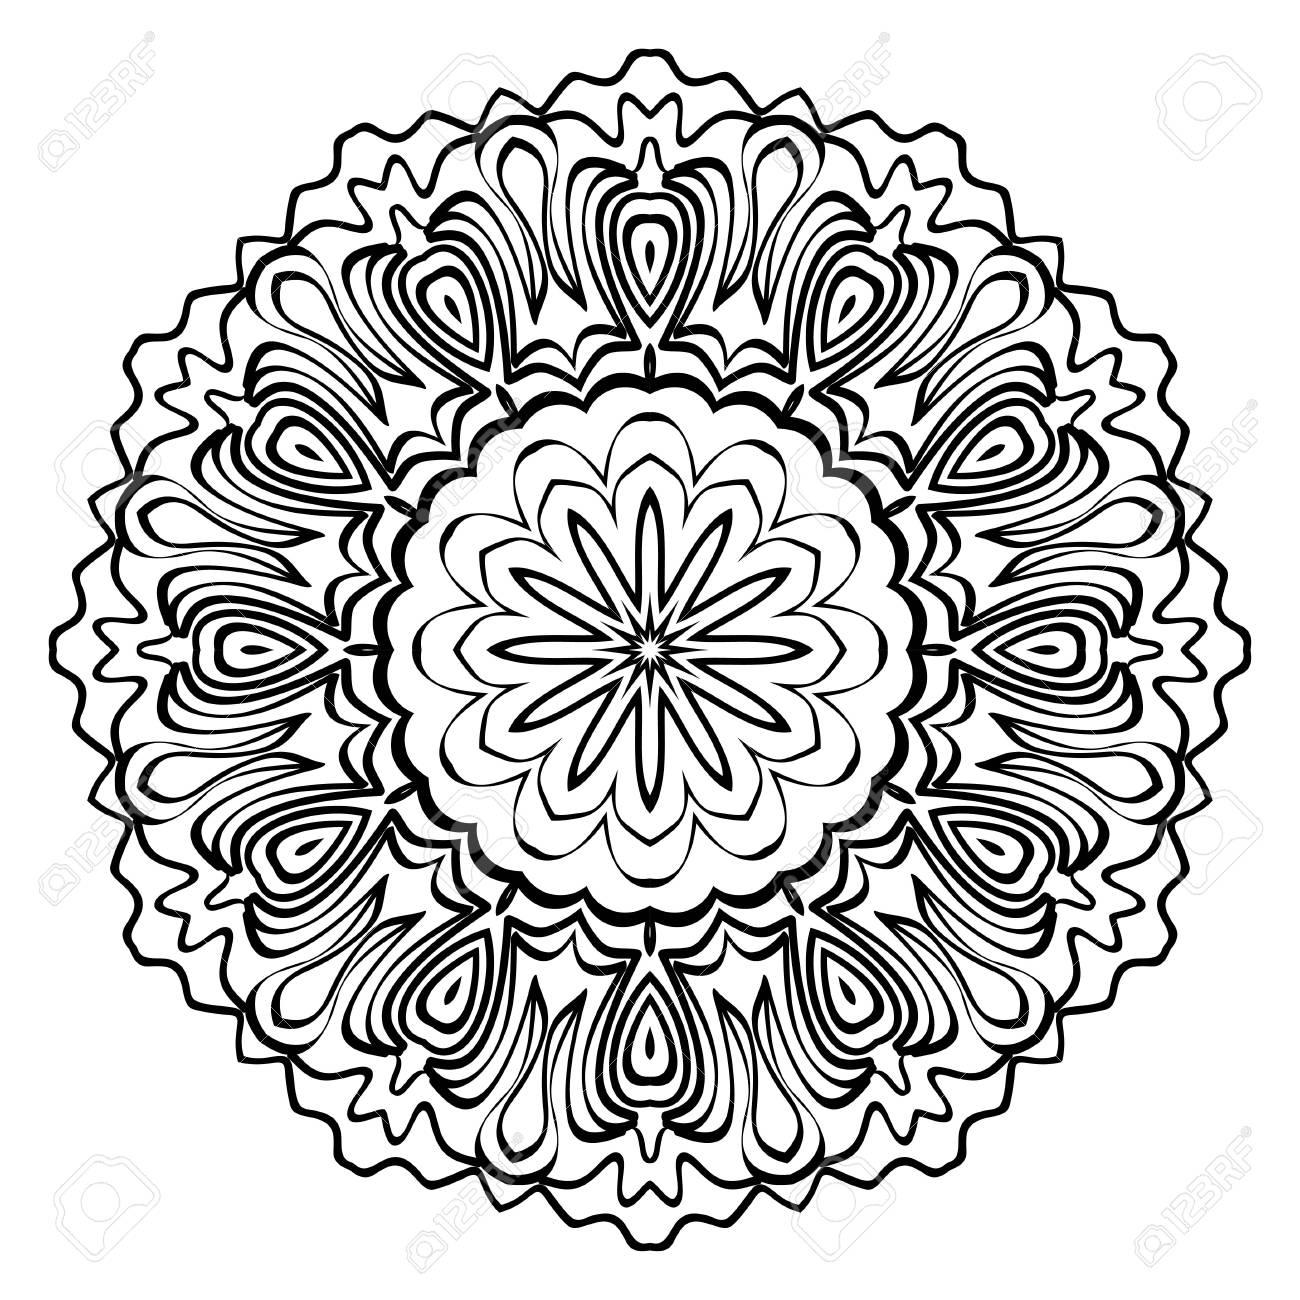 Modern Decorative Cicle Shapes. Floral mandala. vector illustration. - 109749019